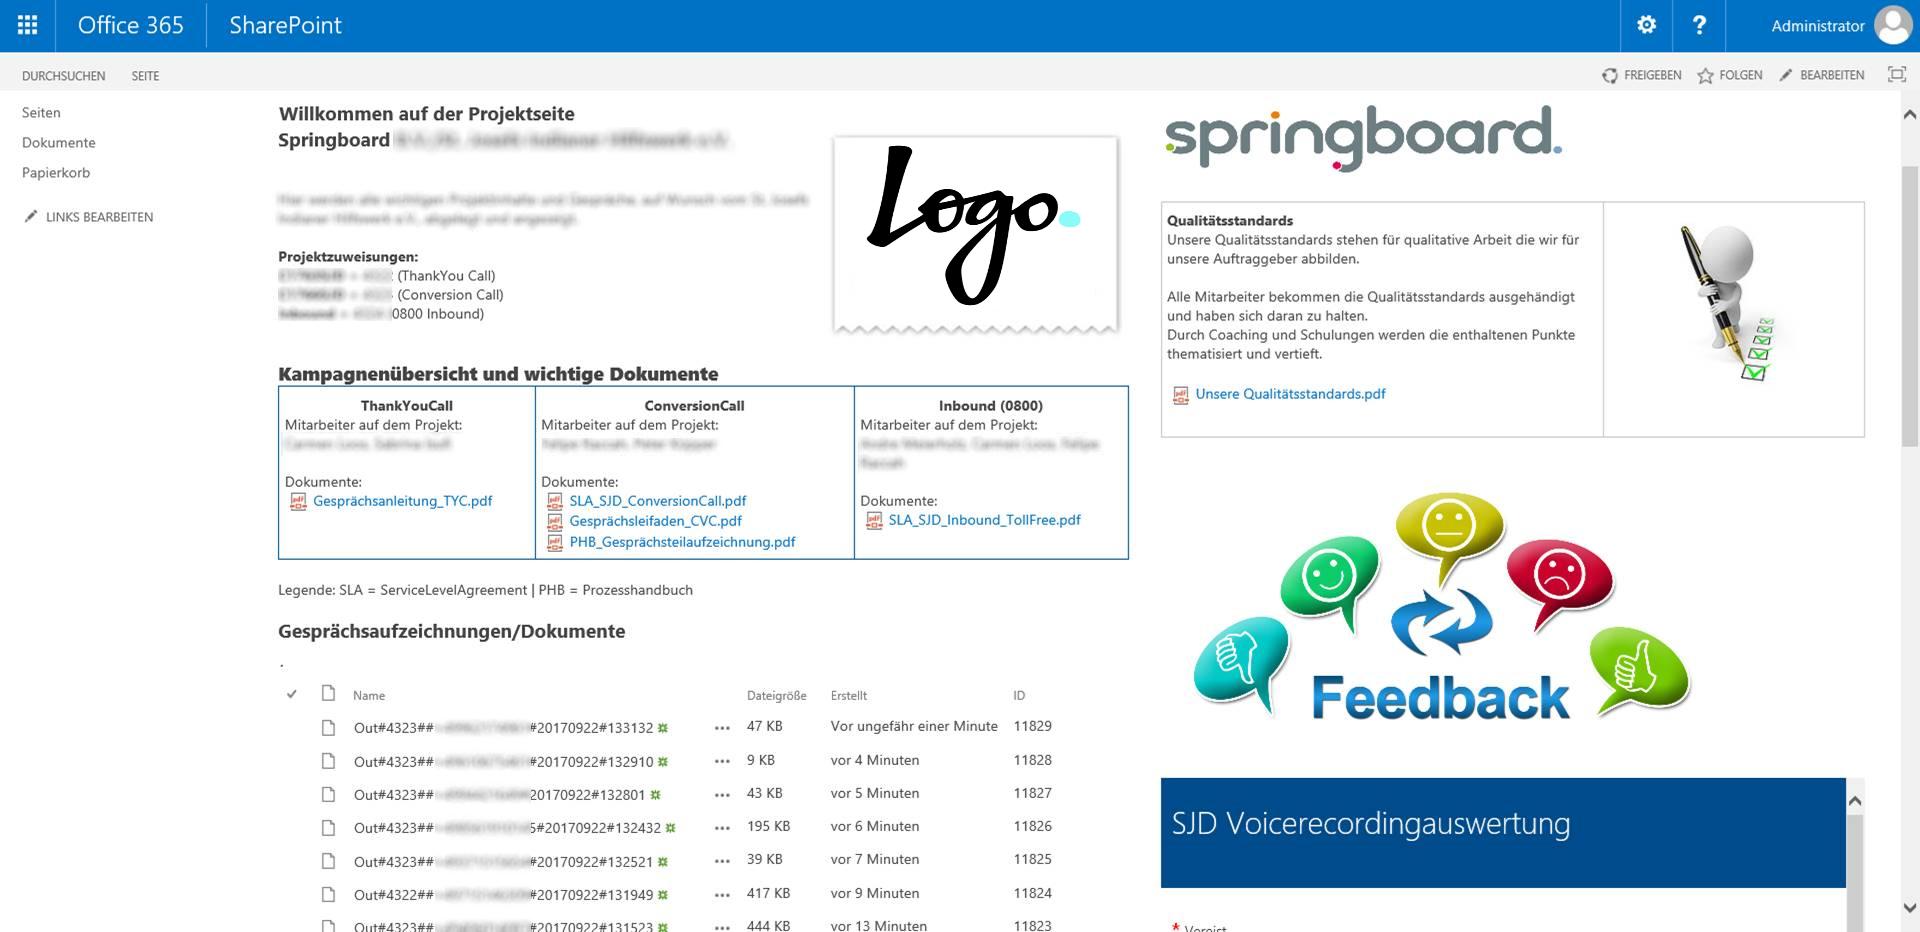 Swyx gespreksopname delen via SharePoint online in meerder talen